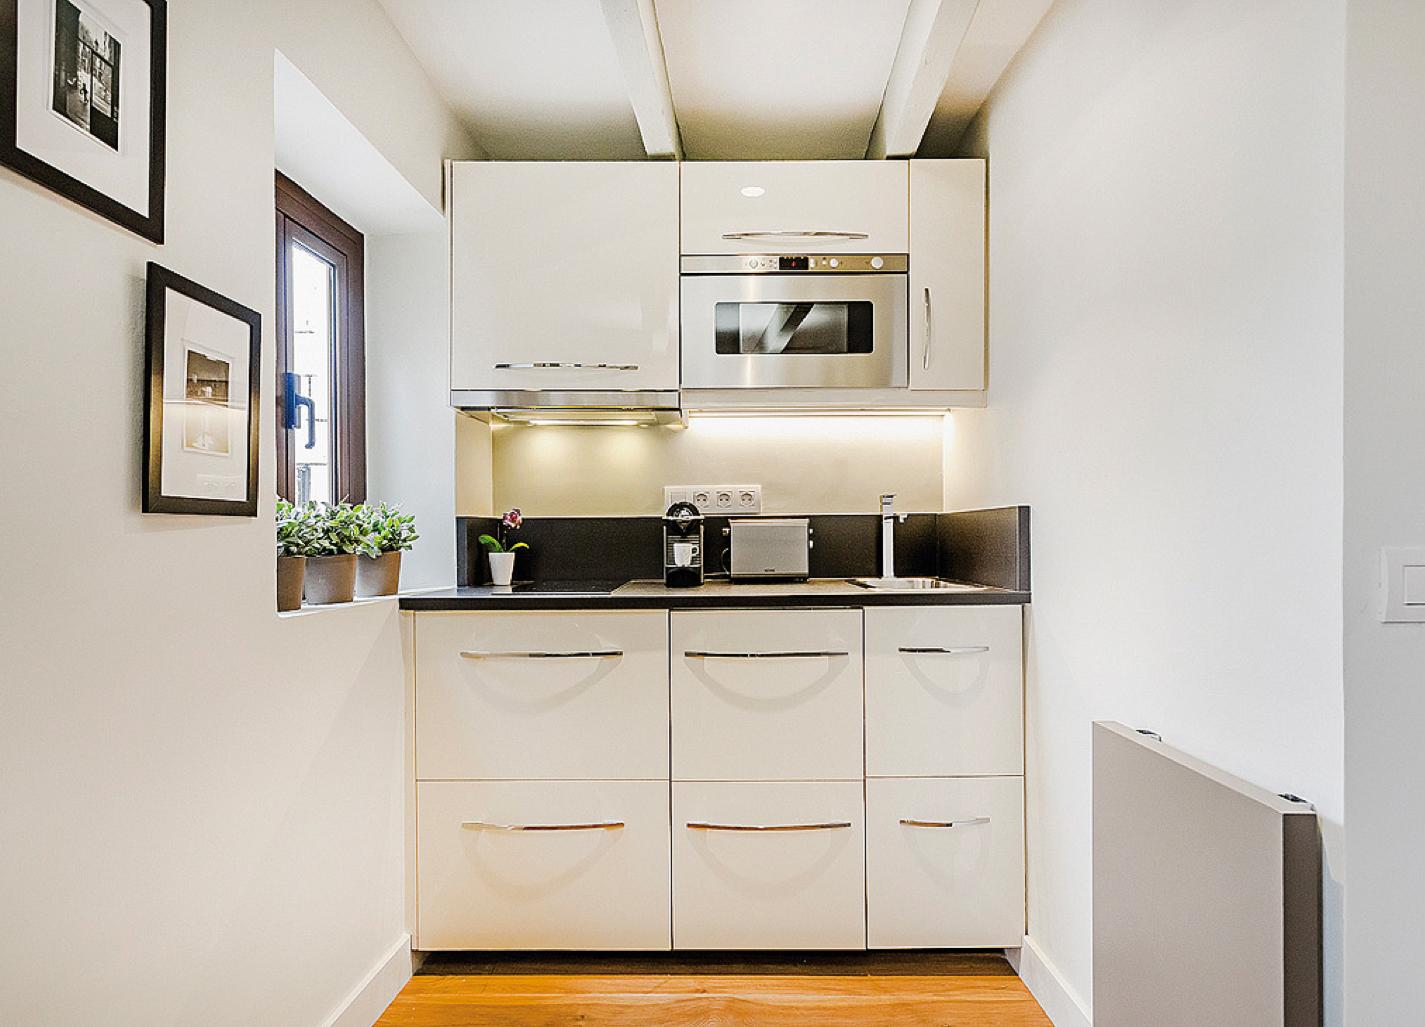 Boiserie c vivere meravigliosamente in 20 metri quadrati - Cucine per miniappartamenti ...